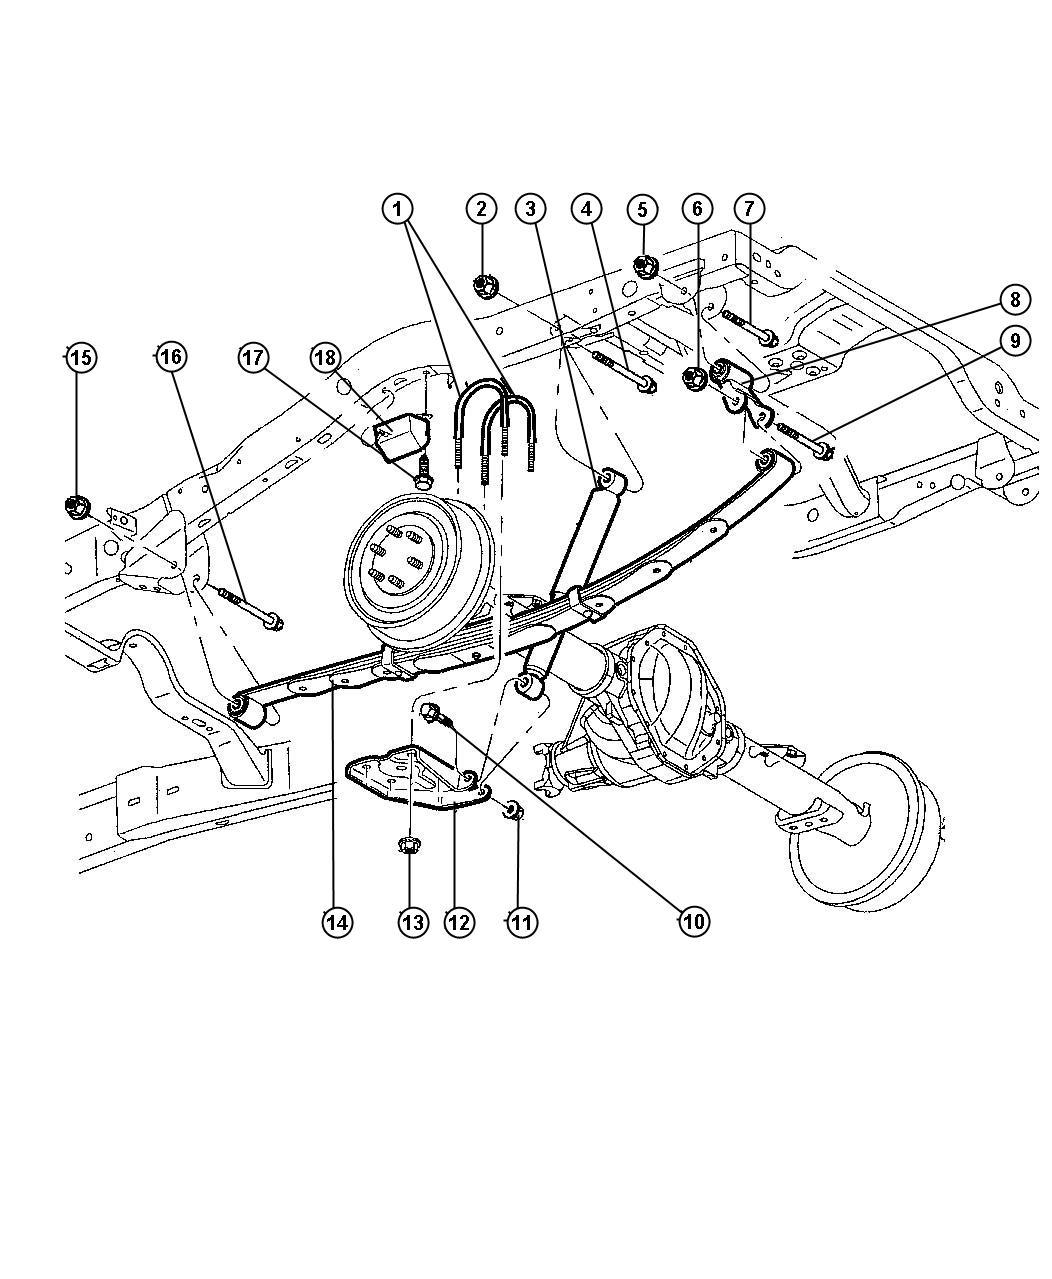 1998 Dodge Durango Suspension, Rear Leaf Spring And Shock